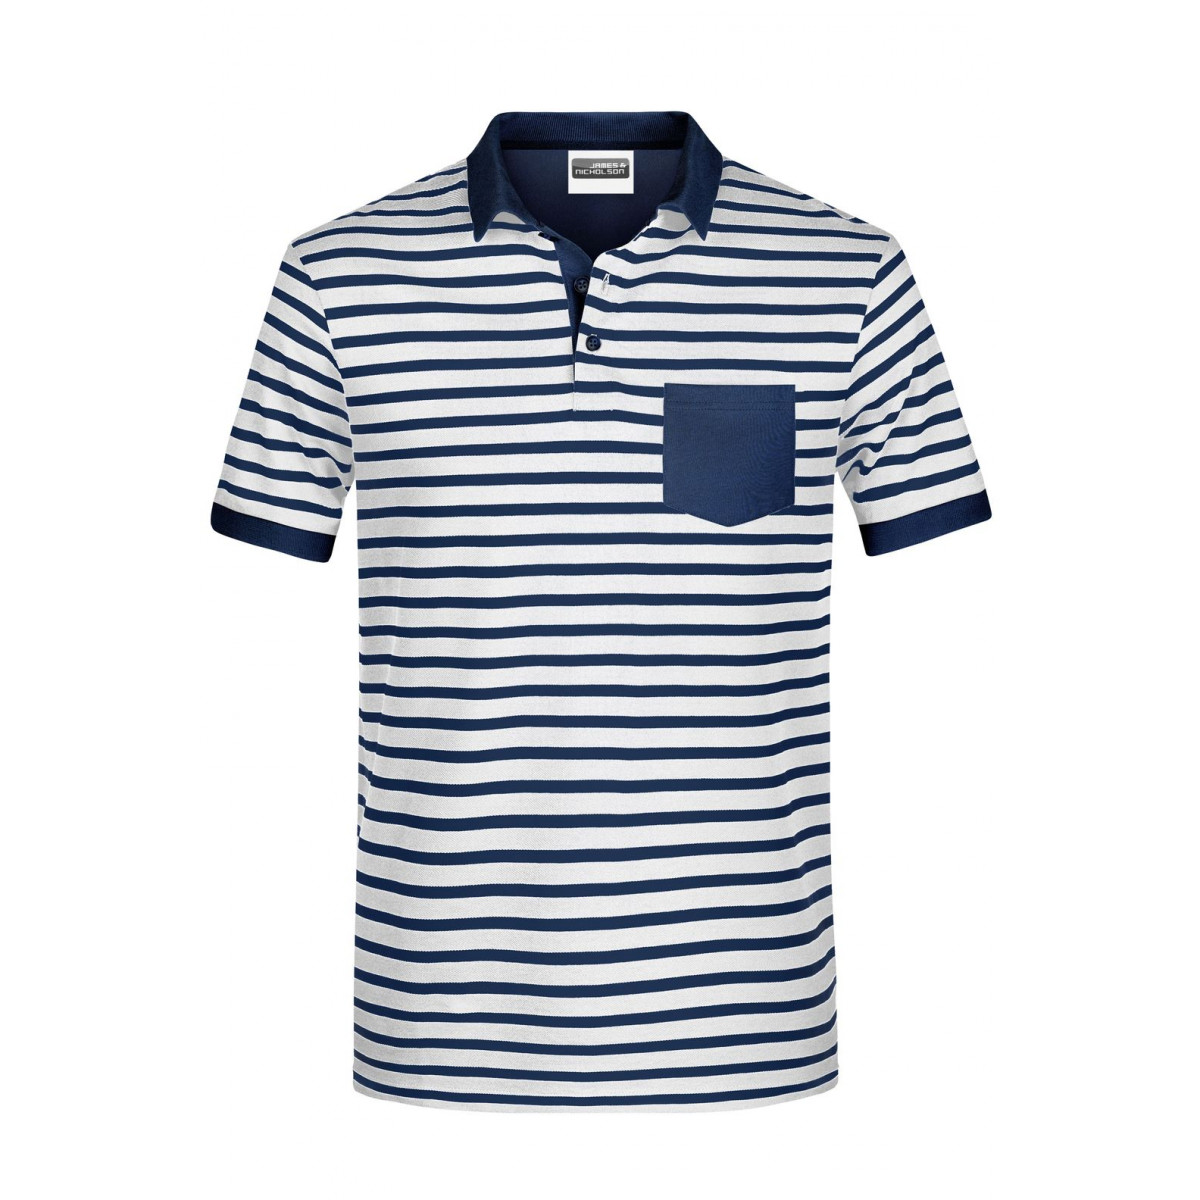 Рубашка поло мужская 8030 Mens Polo Striped - Белый/Темно-синий